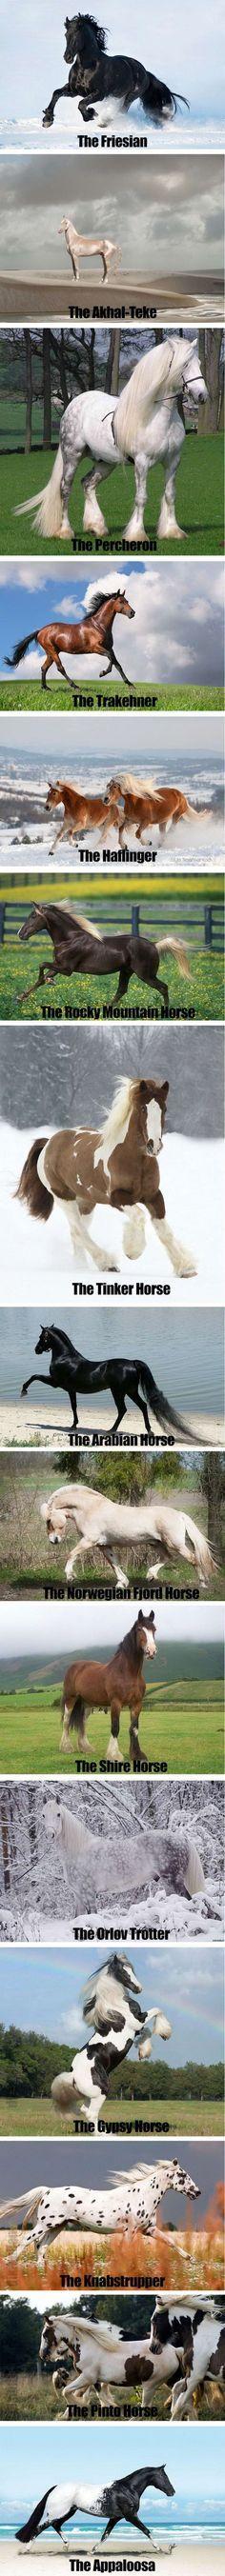 Breathtakingly Beautiful Horses - 9GAG<< Love these breeds! I have an Arabian